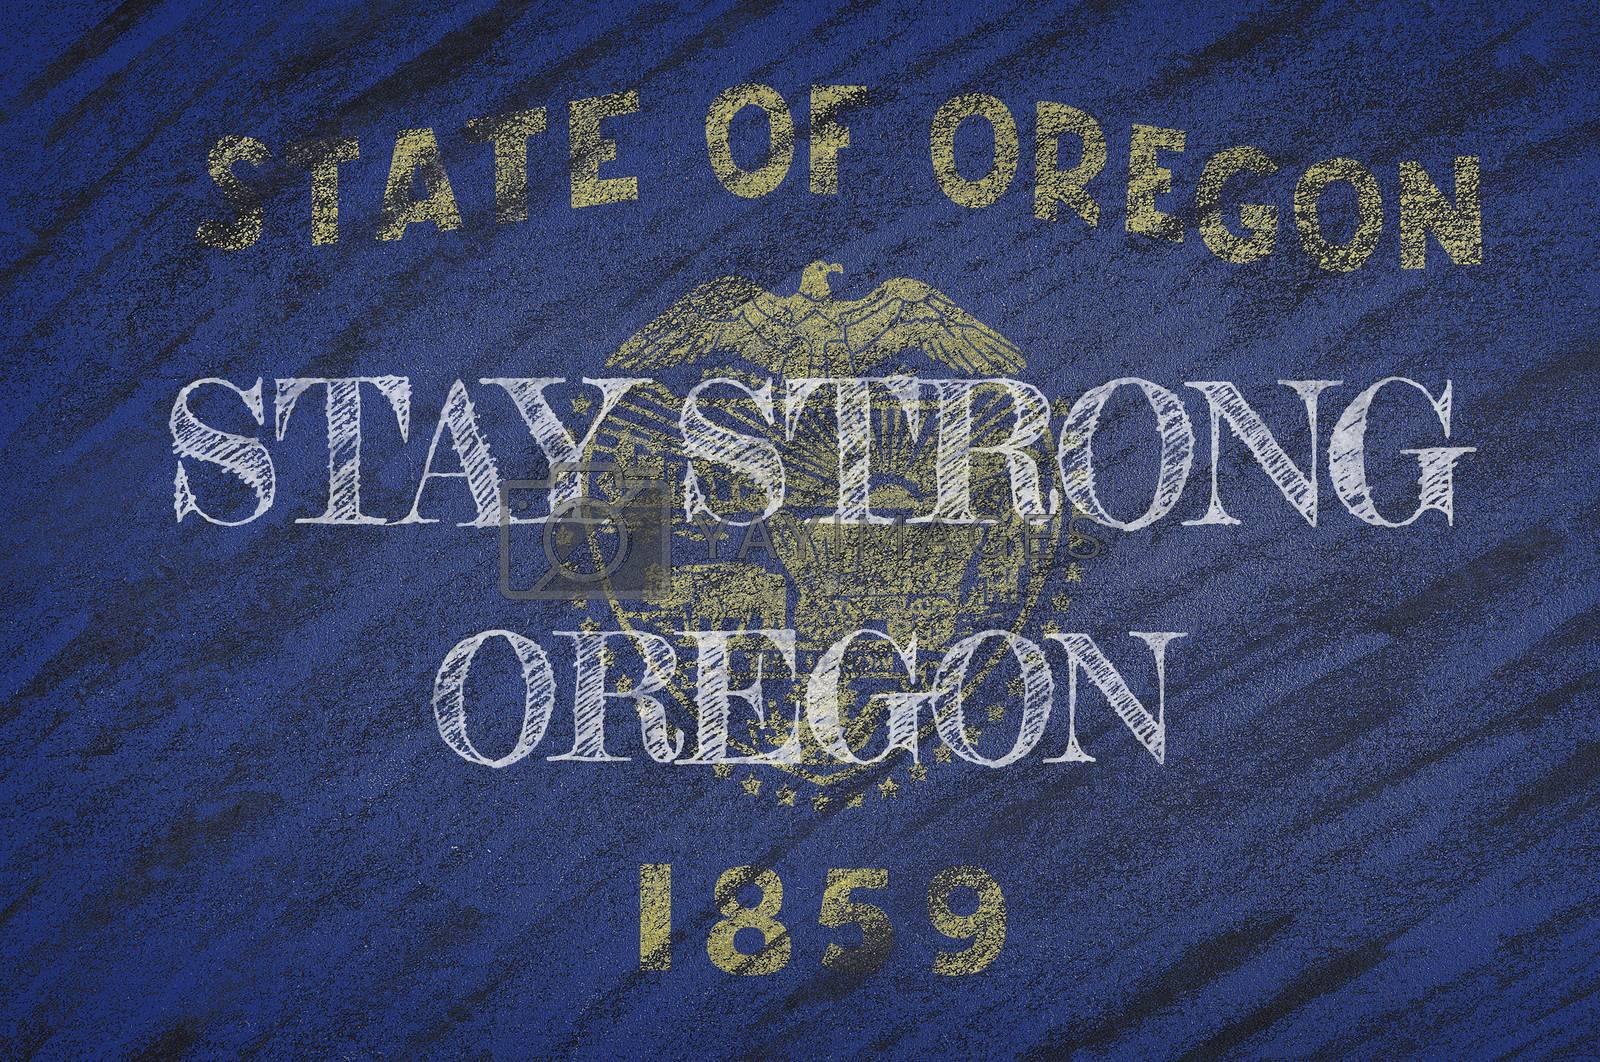 COVID-19 warning. Quarantine zone Covid 19 on Oregon ,flag illustration. Coronavirus danger area, quarantined country. Stay strong.